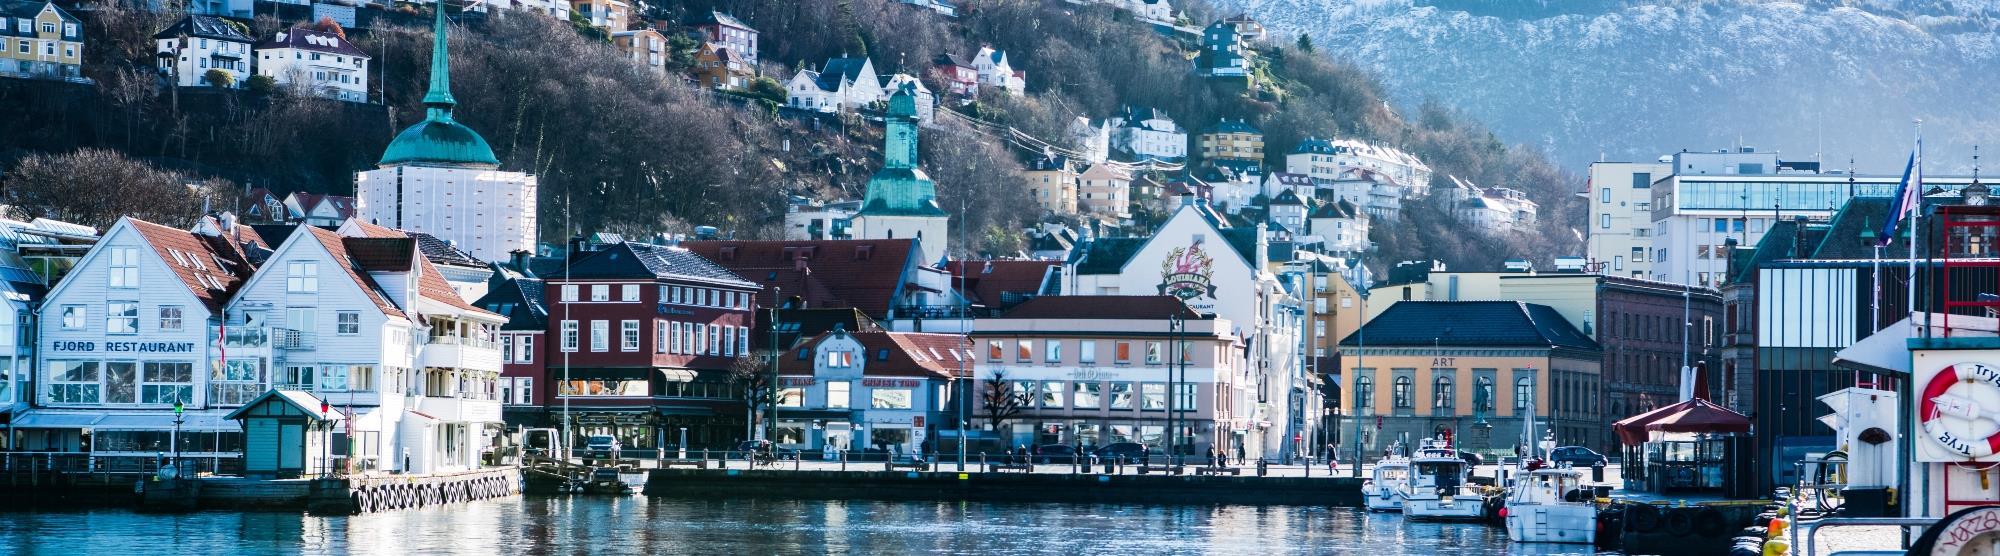 How to get from Ålesund to Bergen